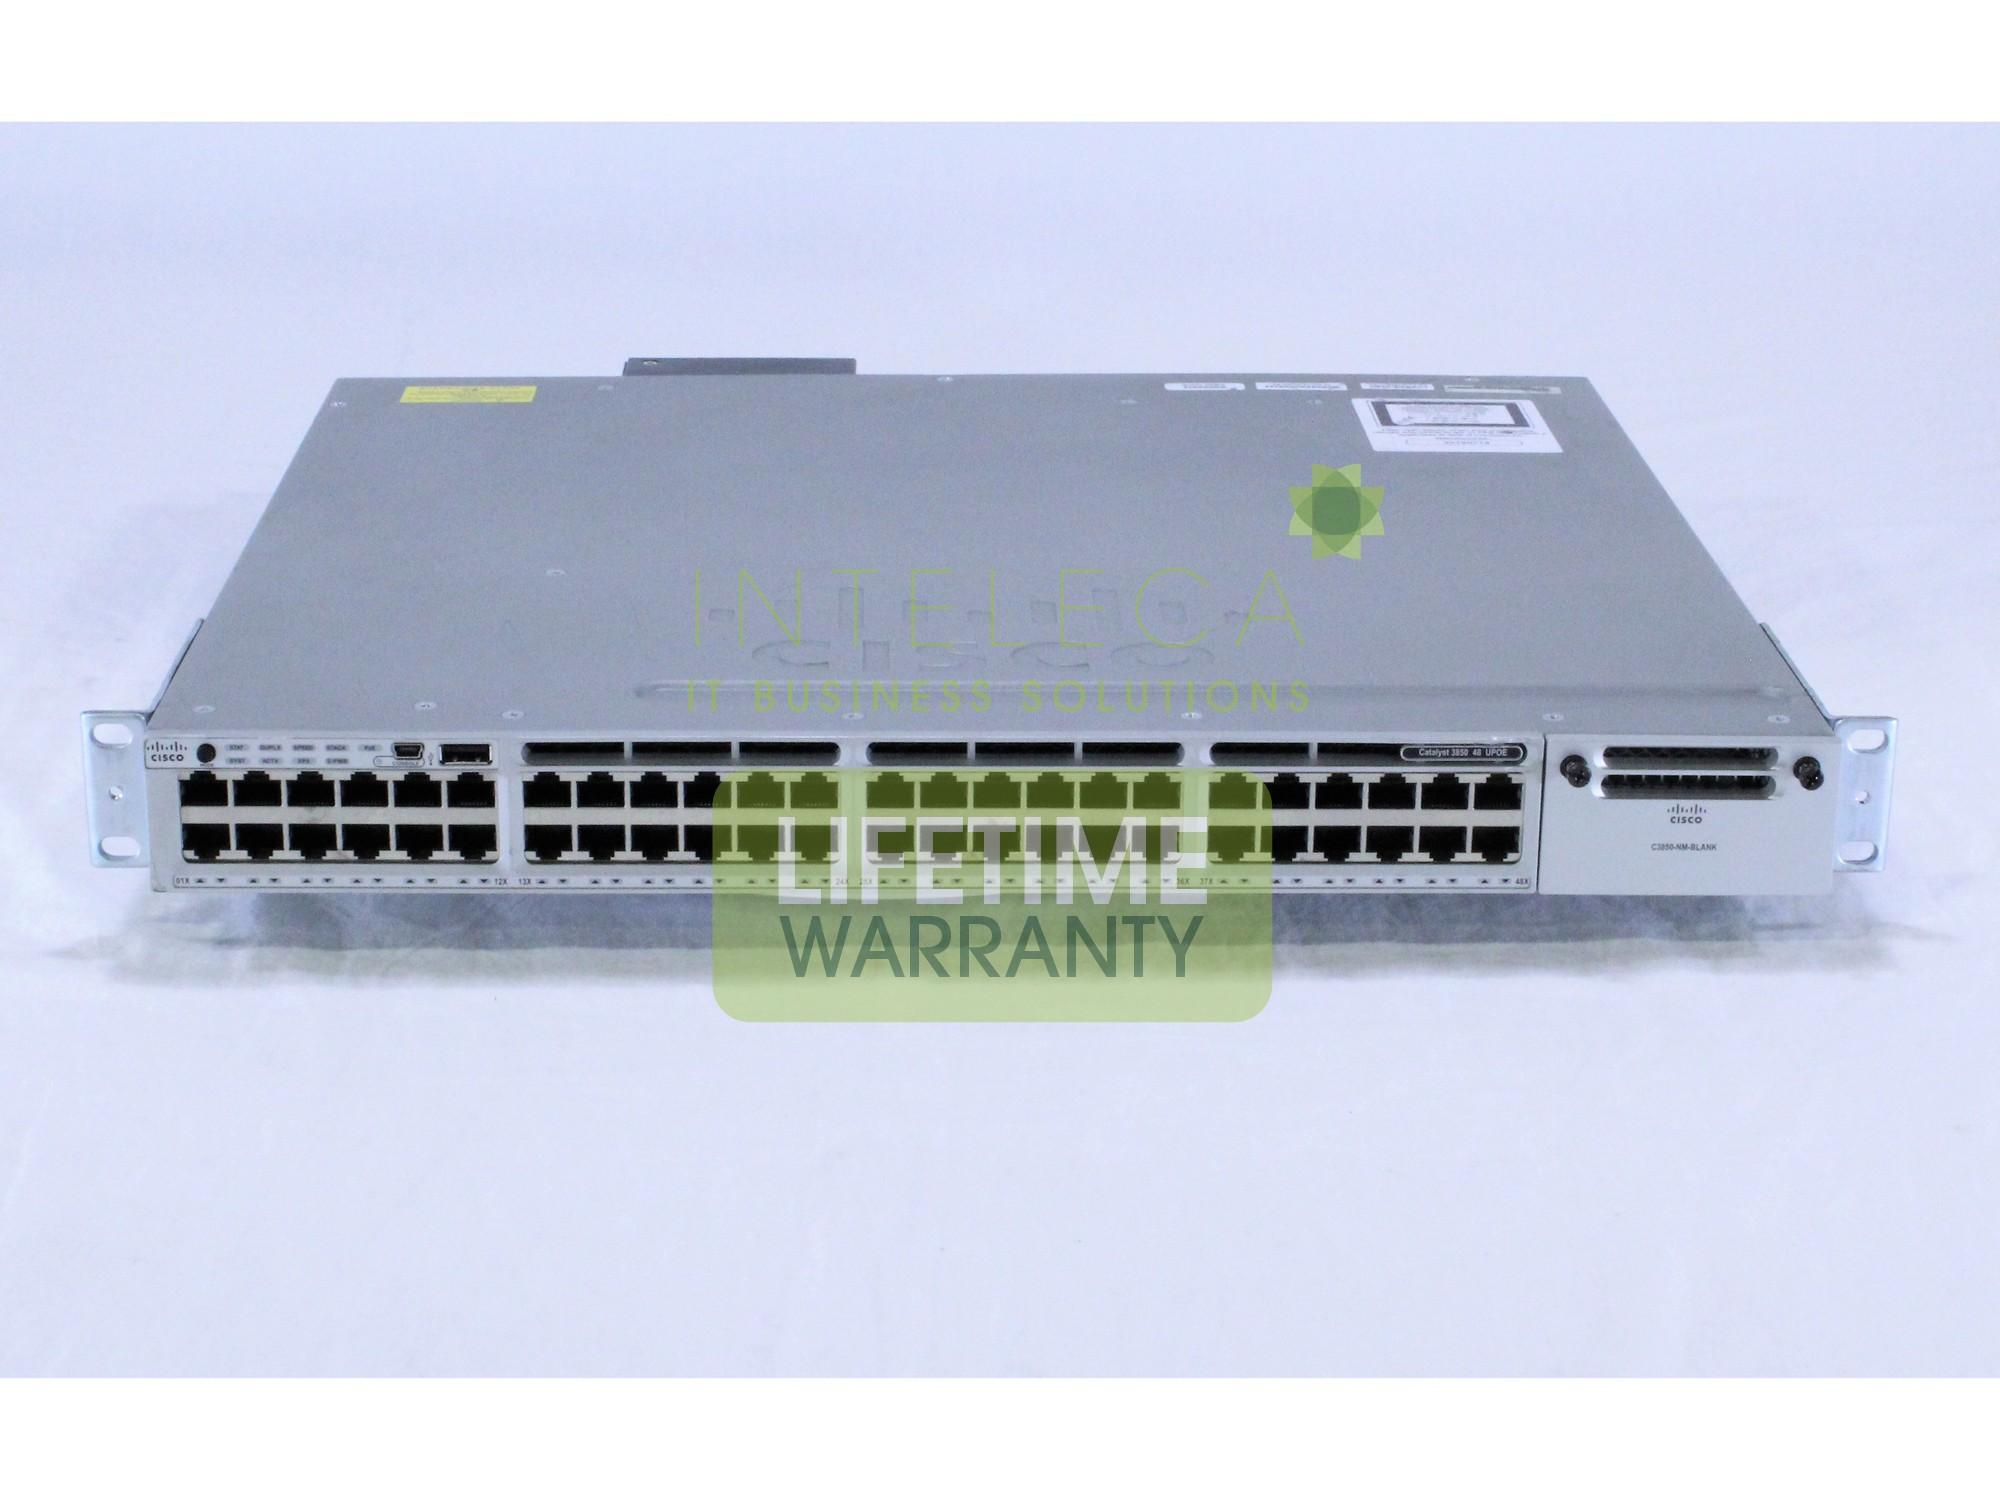 Details about CISCO WS-C3850-48U-L Catalyst 3850 48 Port UPOE LAN Base